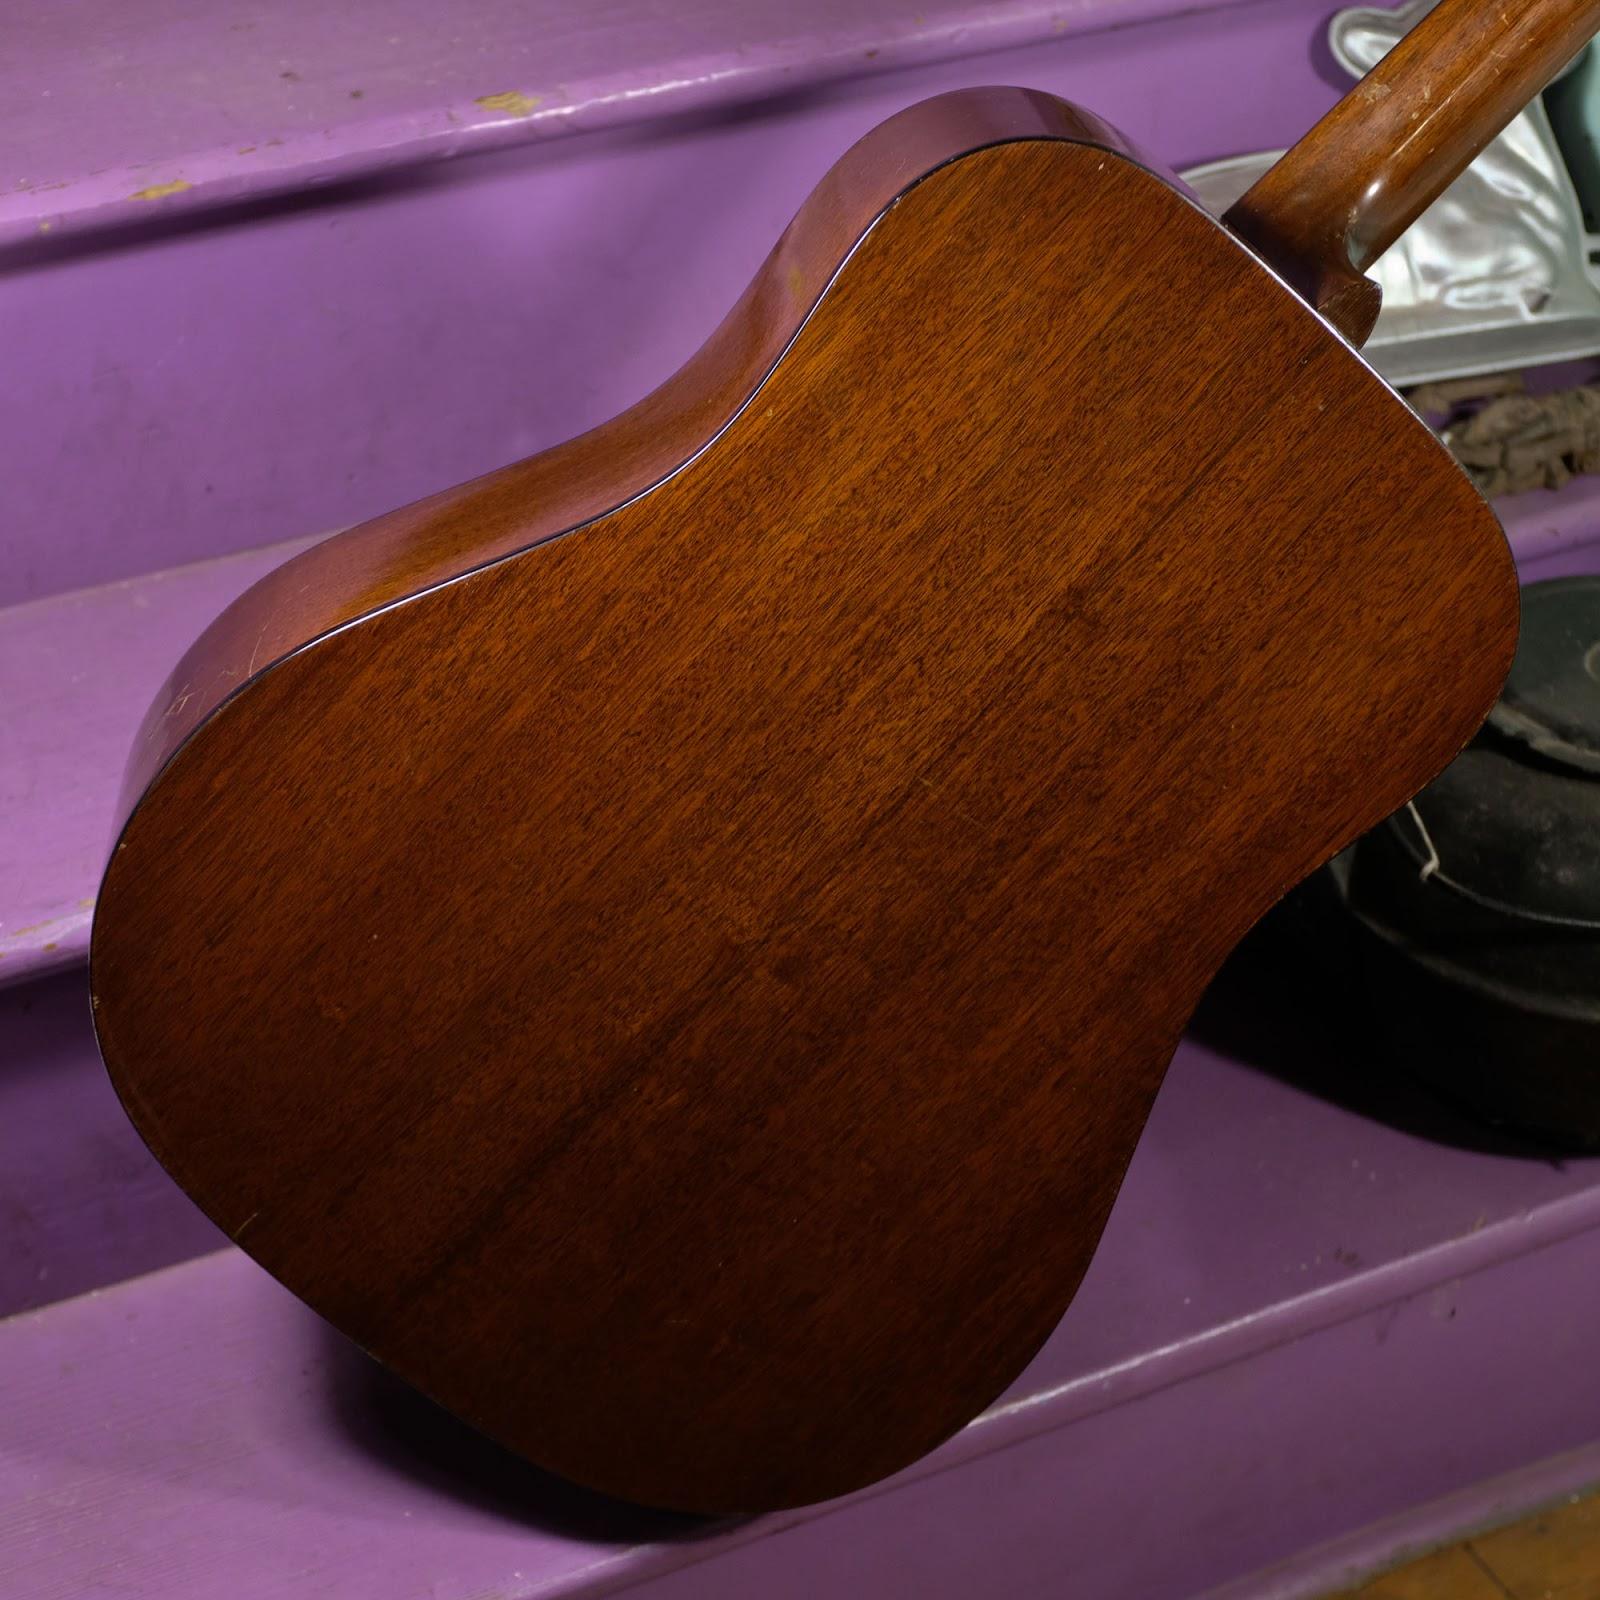 1962 martin d 18 dreadnought guitar. Black Bedroom Furniture Sets. Home Design Ideas